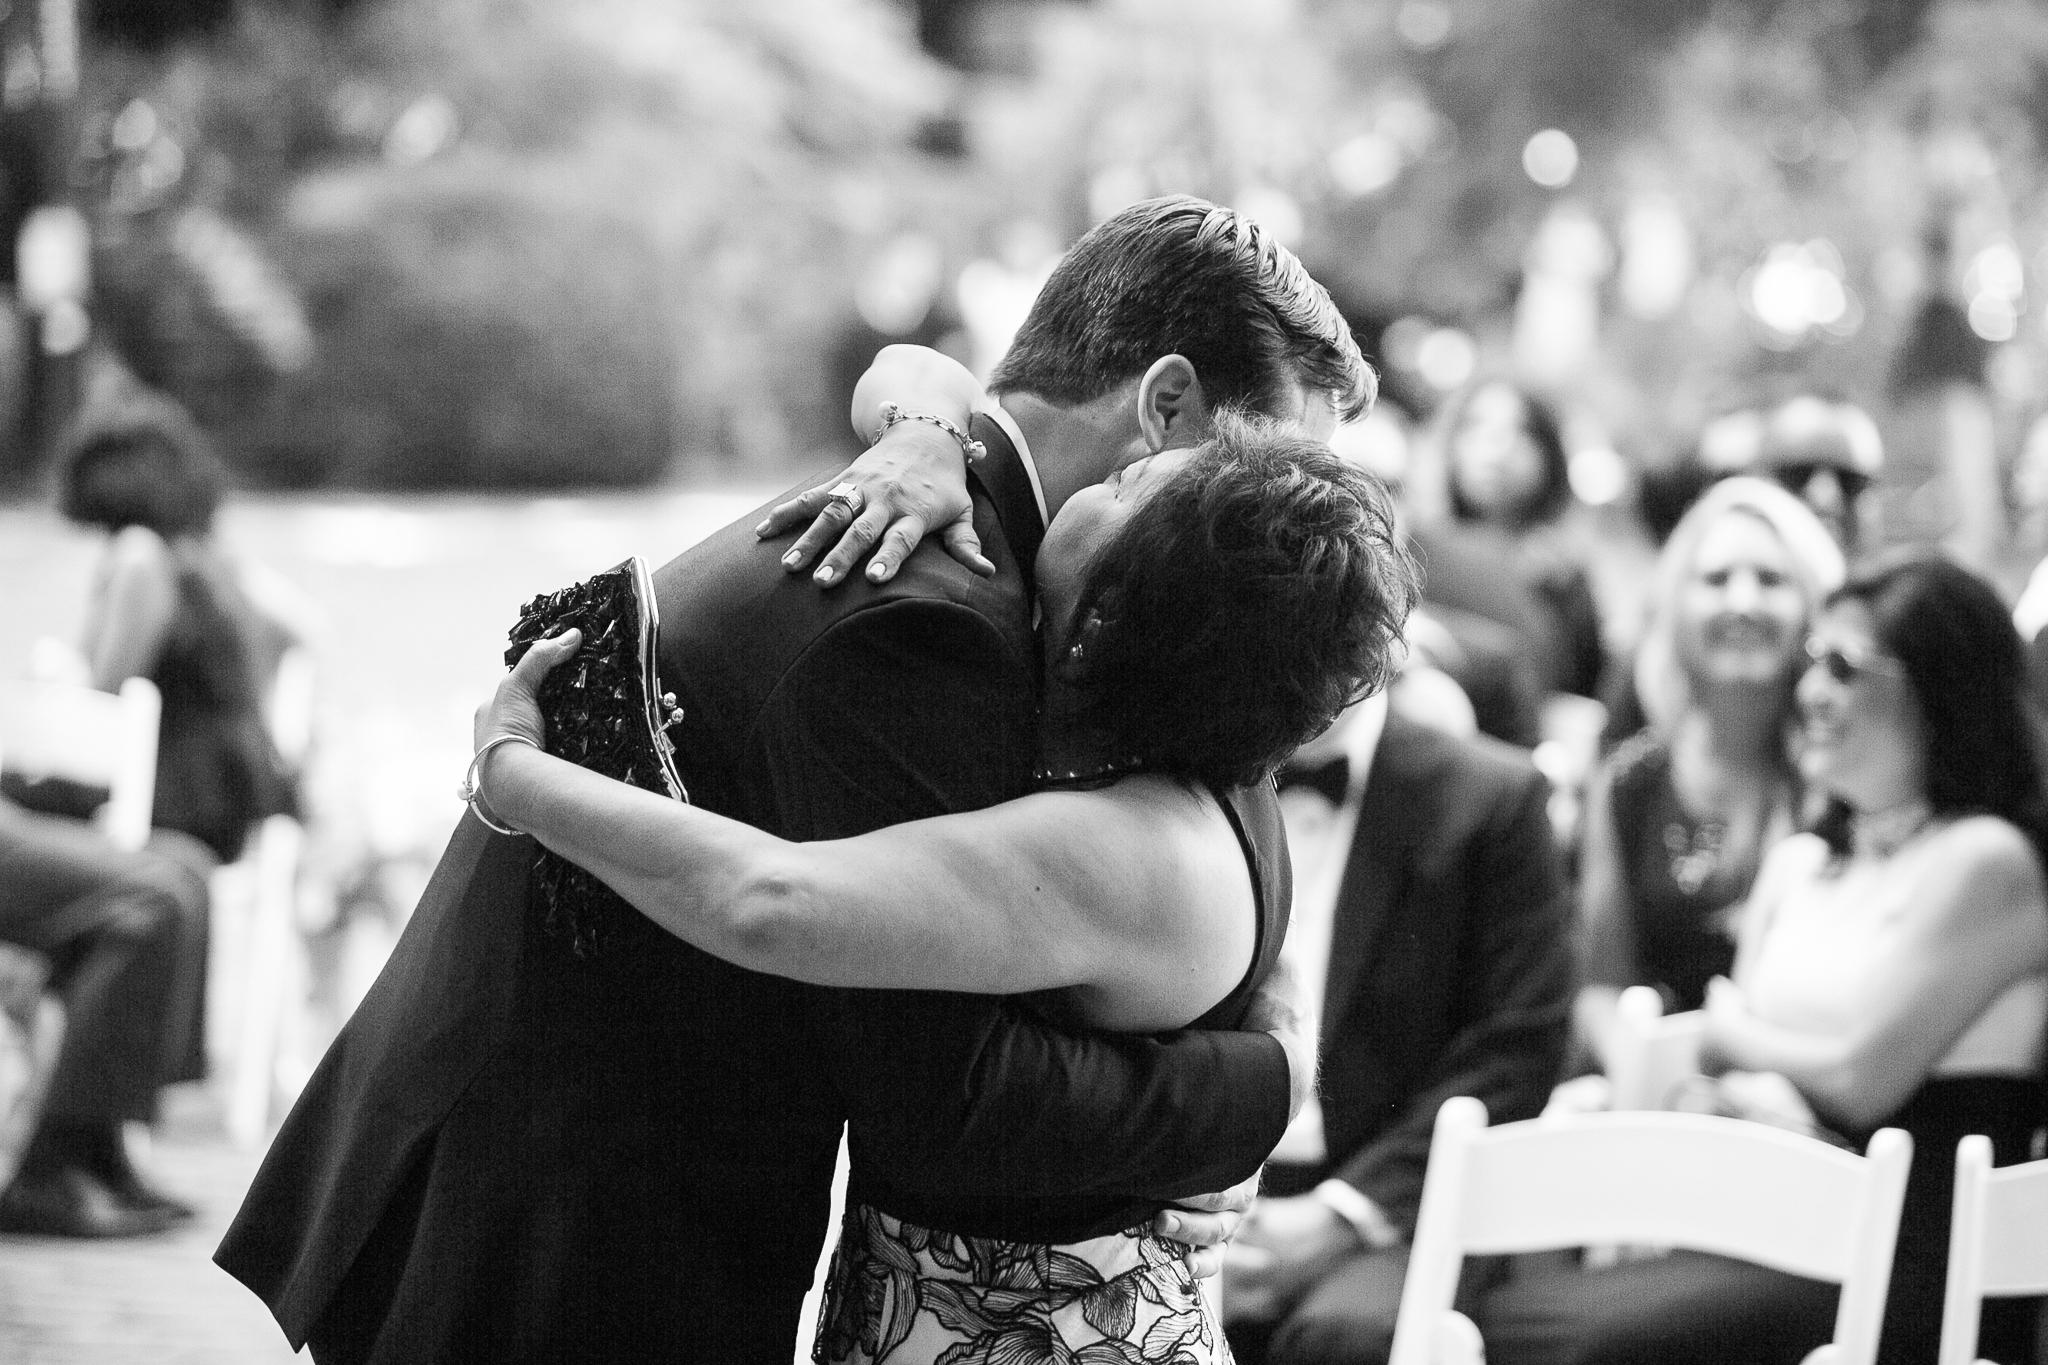 128OutliveCreative_Travel_Photographer_Videographer_Lewis&Clark_Oregon_Elegant_BlackTie_Destination_Wedding.jpg